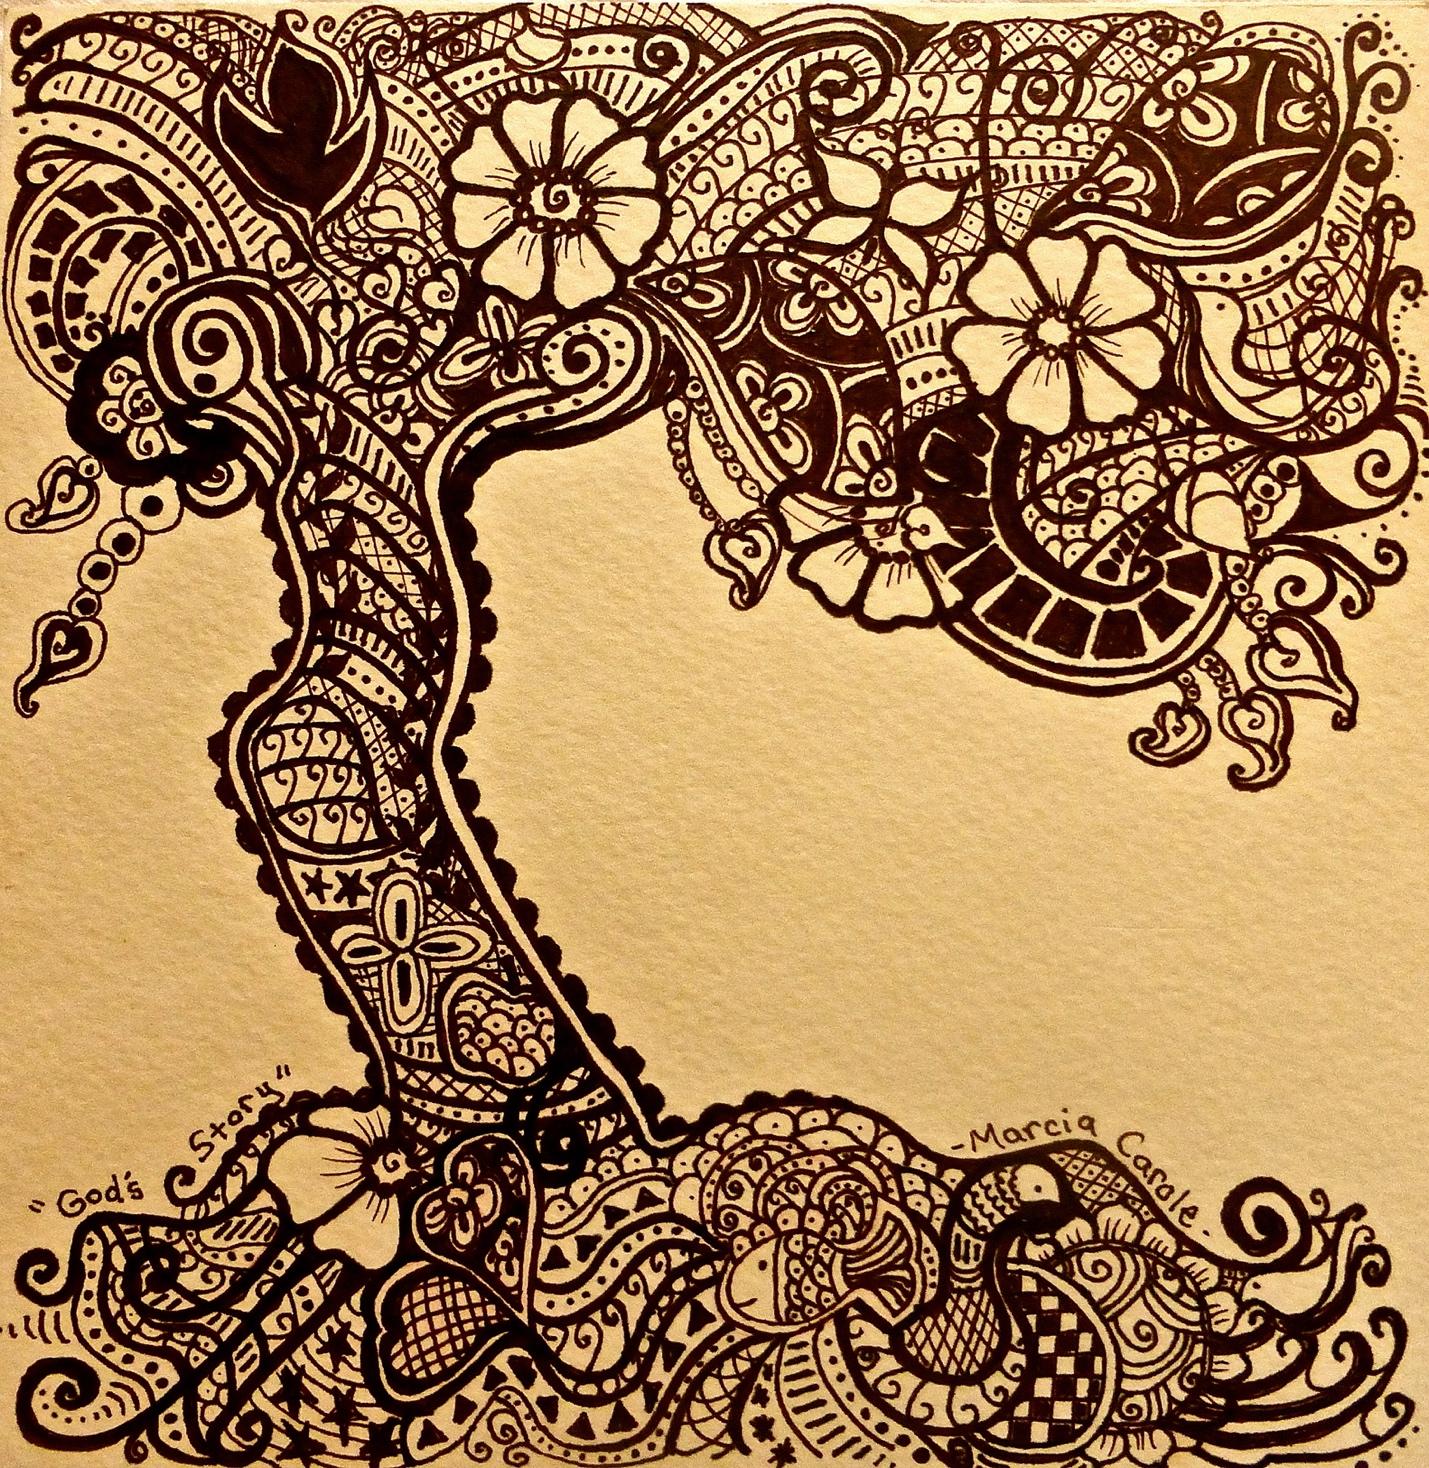 Mehndi Art, My Daughter and Life